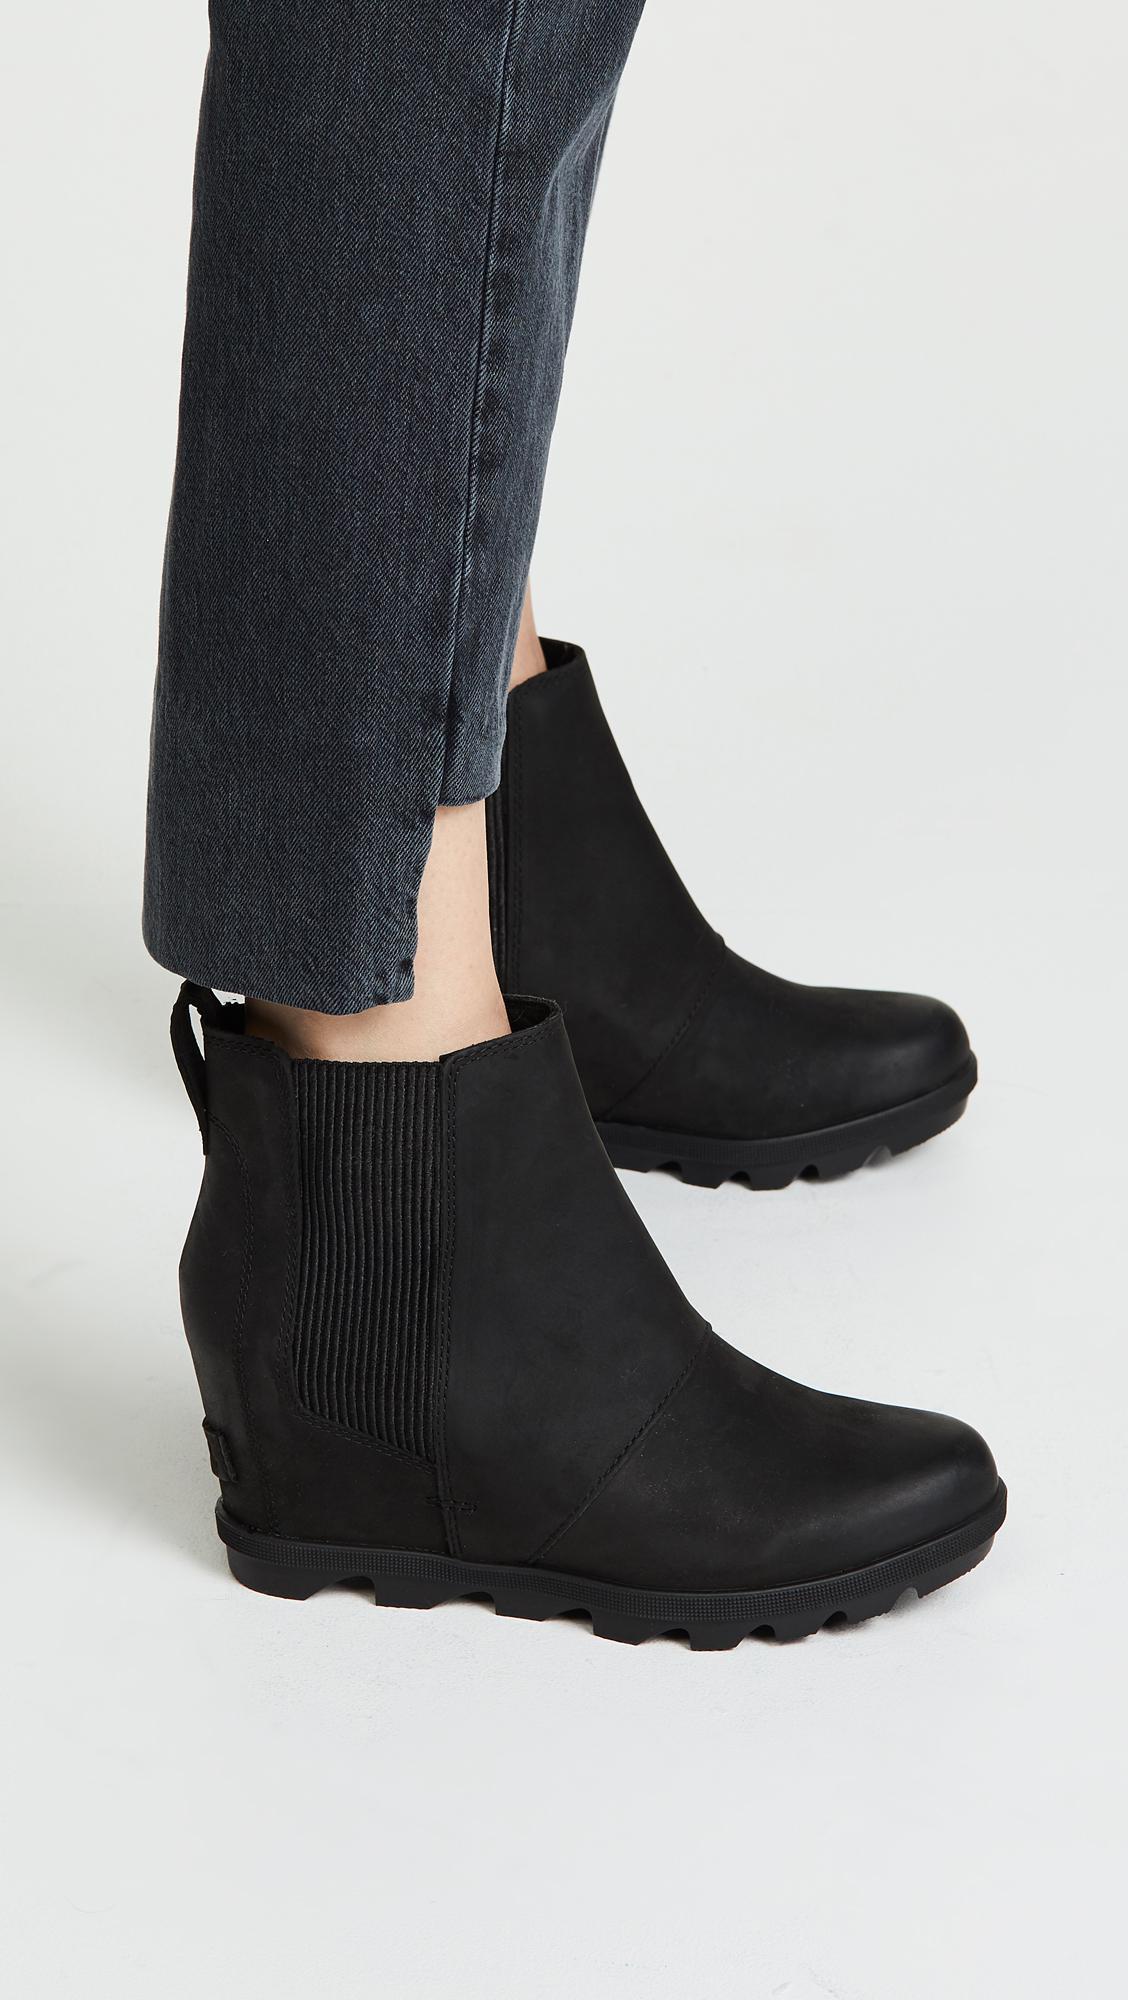 5c14d1680d4 Lyst - Sorel Joan Of Arctic Wedge Boot Black in Black - Save 45%